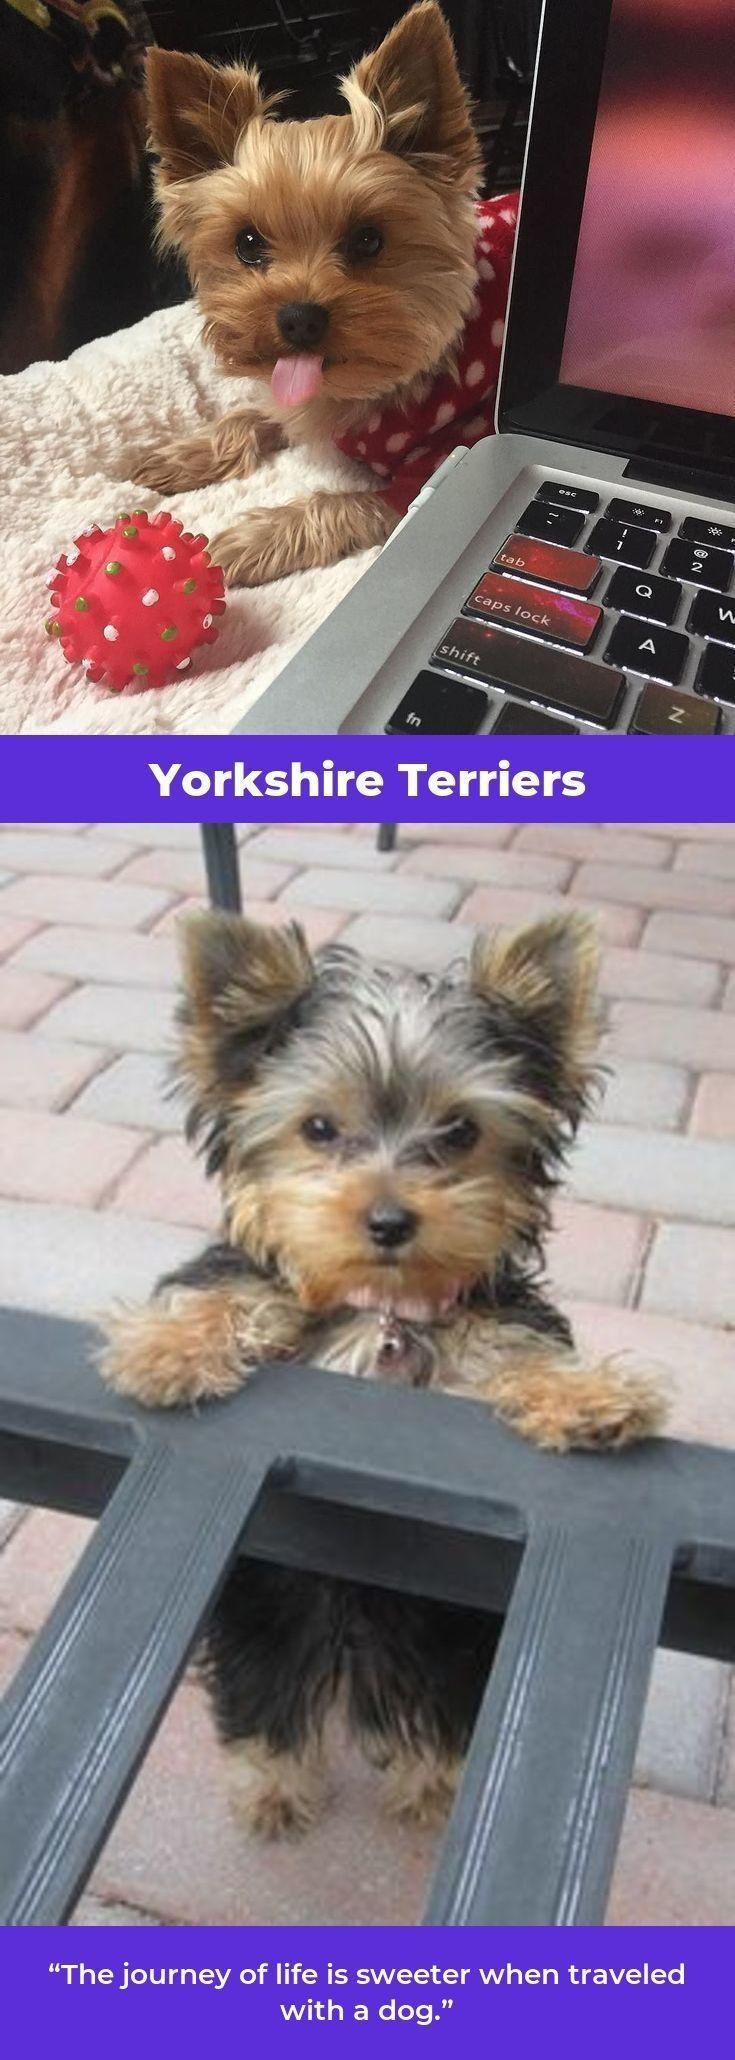 Yorkshire Terrier Pup Yorkshireterrierstagram Yorkshireterriersofinstagram1 Yorkshire Terrier Funny Yorkshire Terrier Yorkshire Terrier Puppies